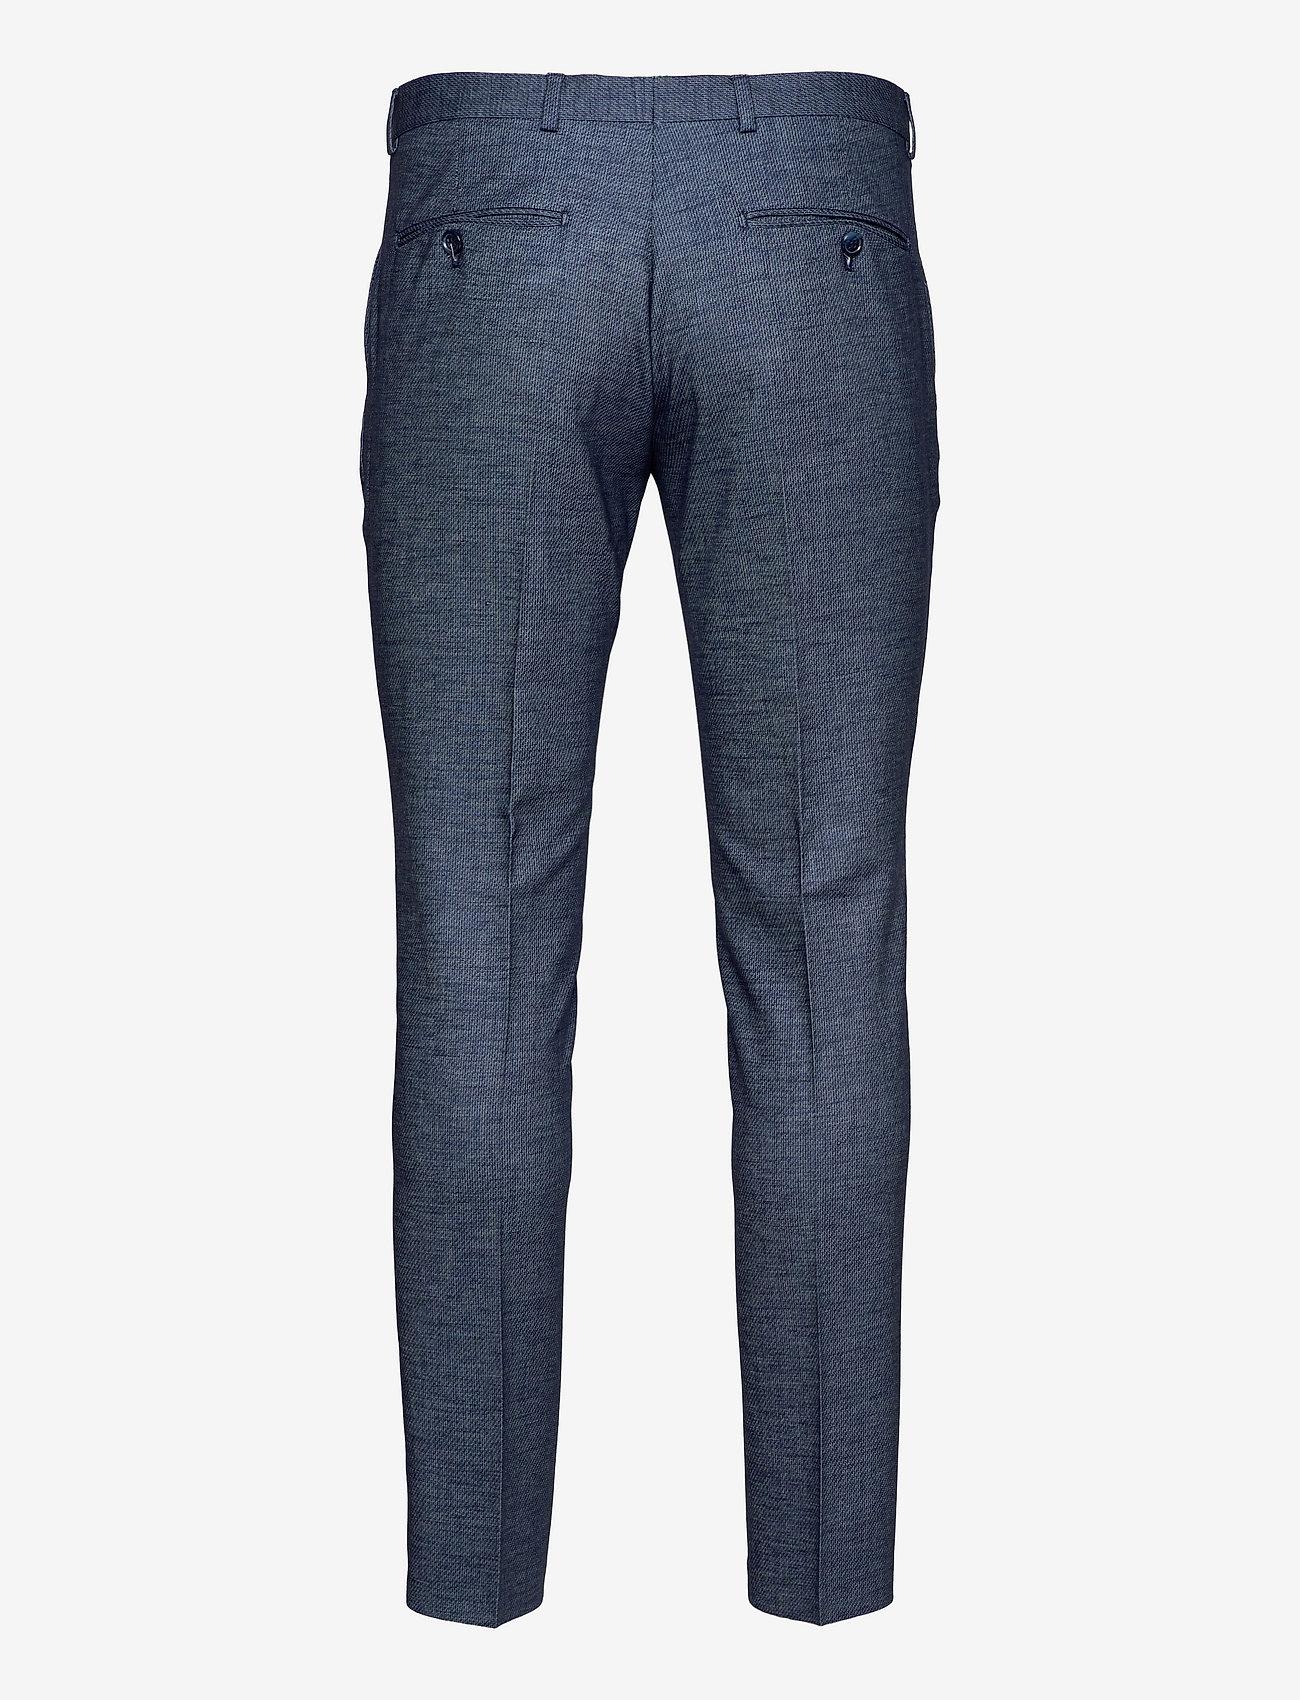 Selected Homme - SLHSLIM-RORYBILL DK BLUE TWILL TRS B - slim jeans - dark blue - 1